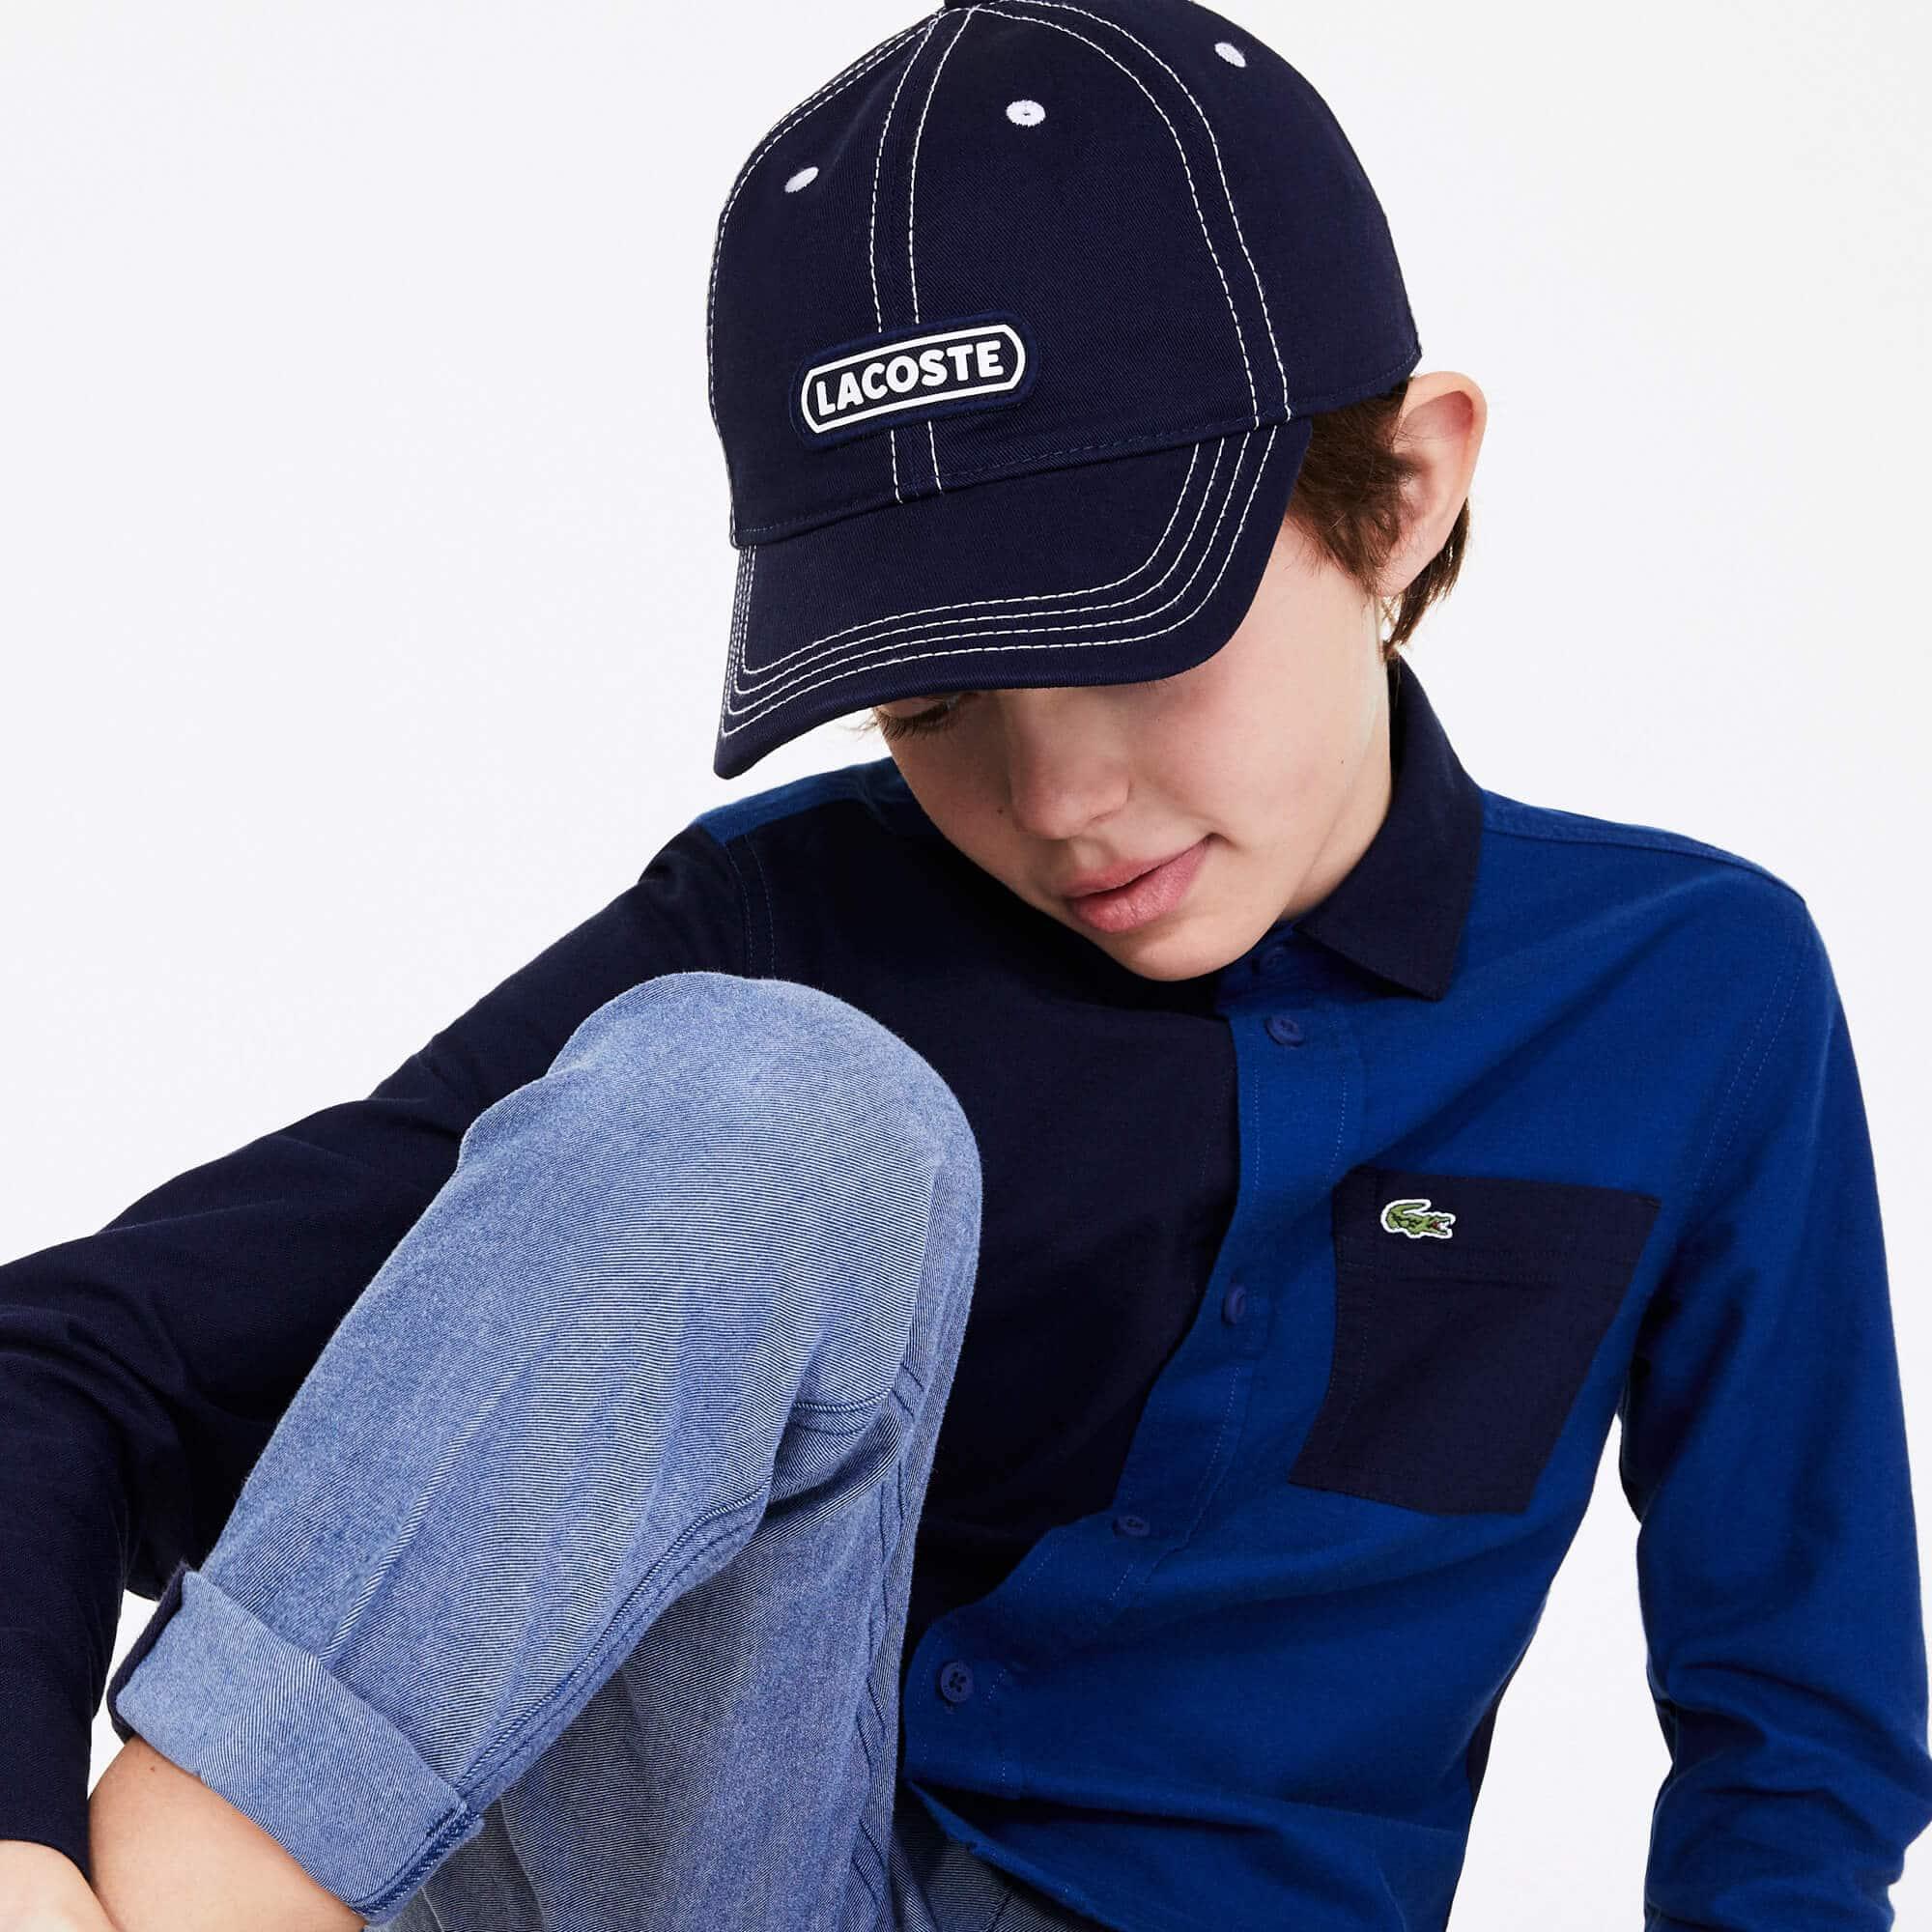 Gorra de niño Lacoste de algodón con insignia